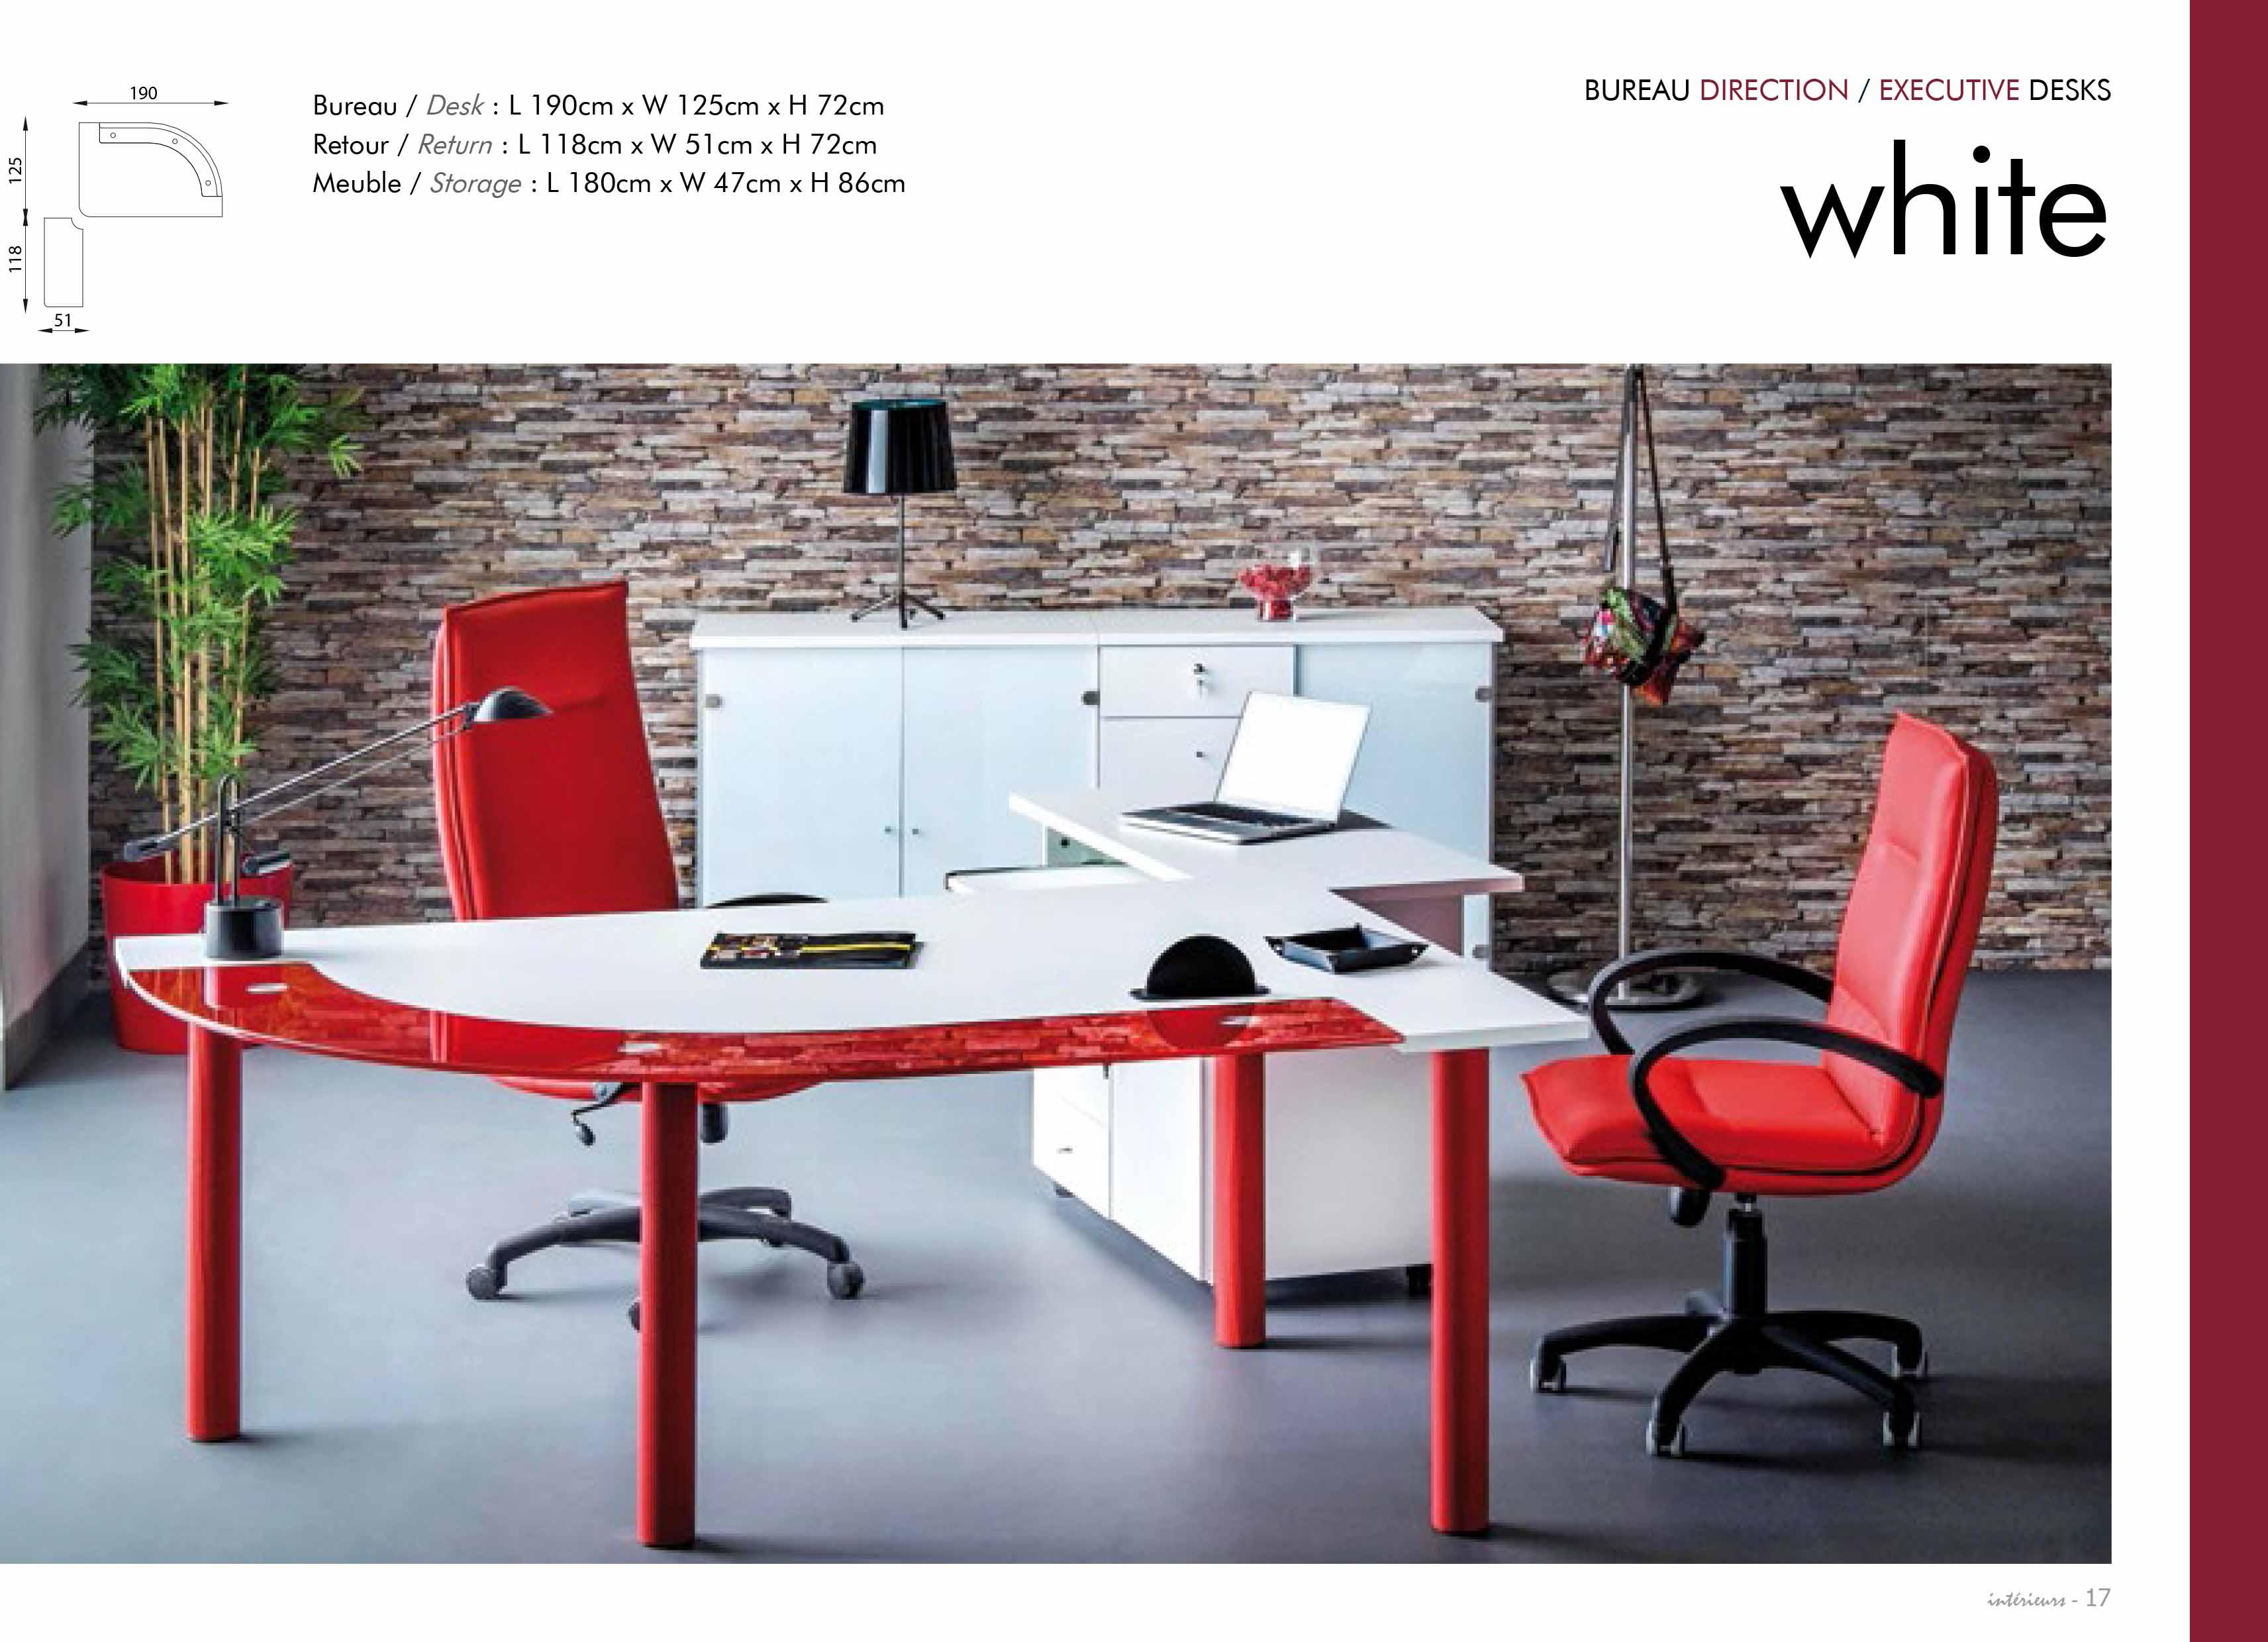 Bureau meubles tunis meubles occasion tunisie achat bureau meuble